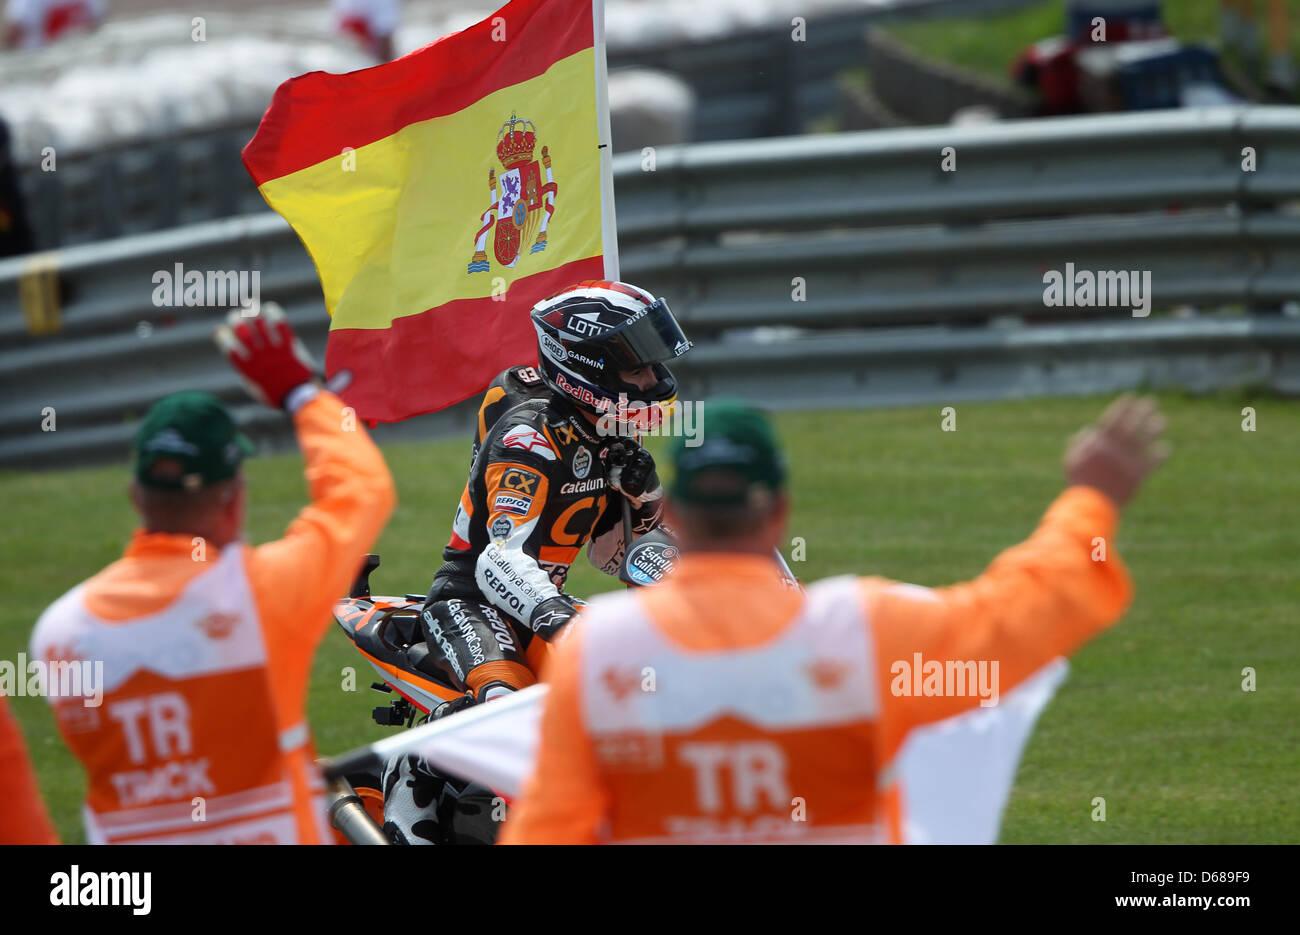 Spanish rider Marc Marquez of Team CatalunyaCaixa Repsol wins the Moto2 German Grand Prix at Sachsenring in Hohenstein - Stock Image